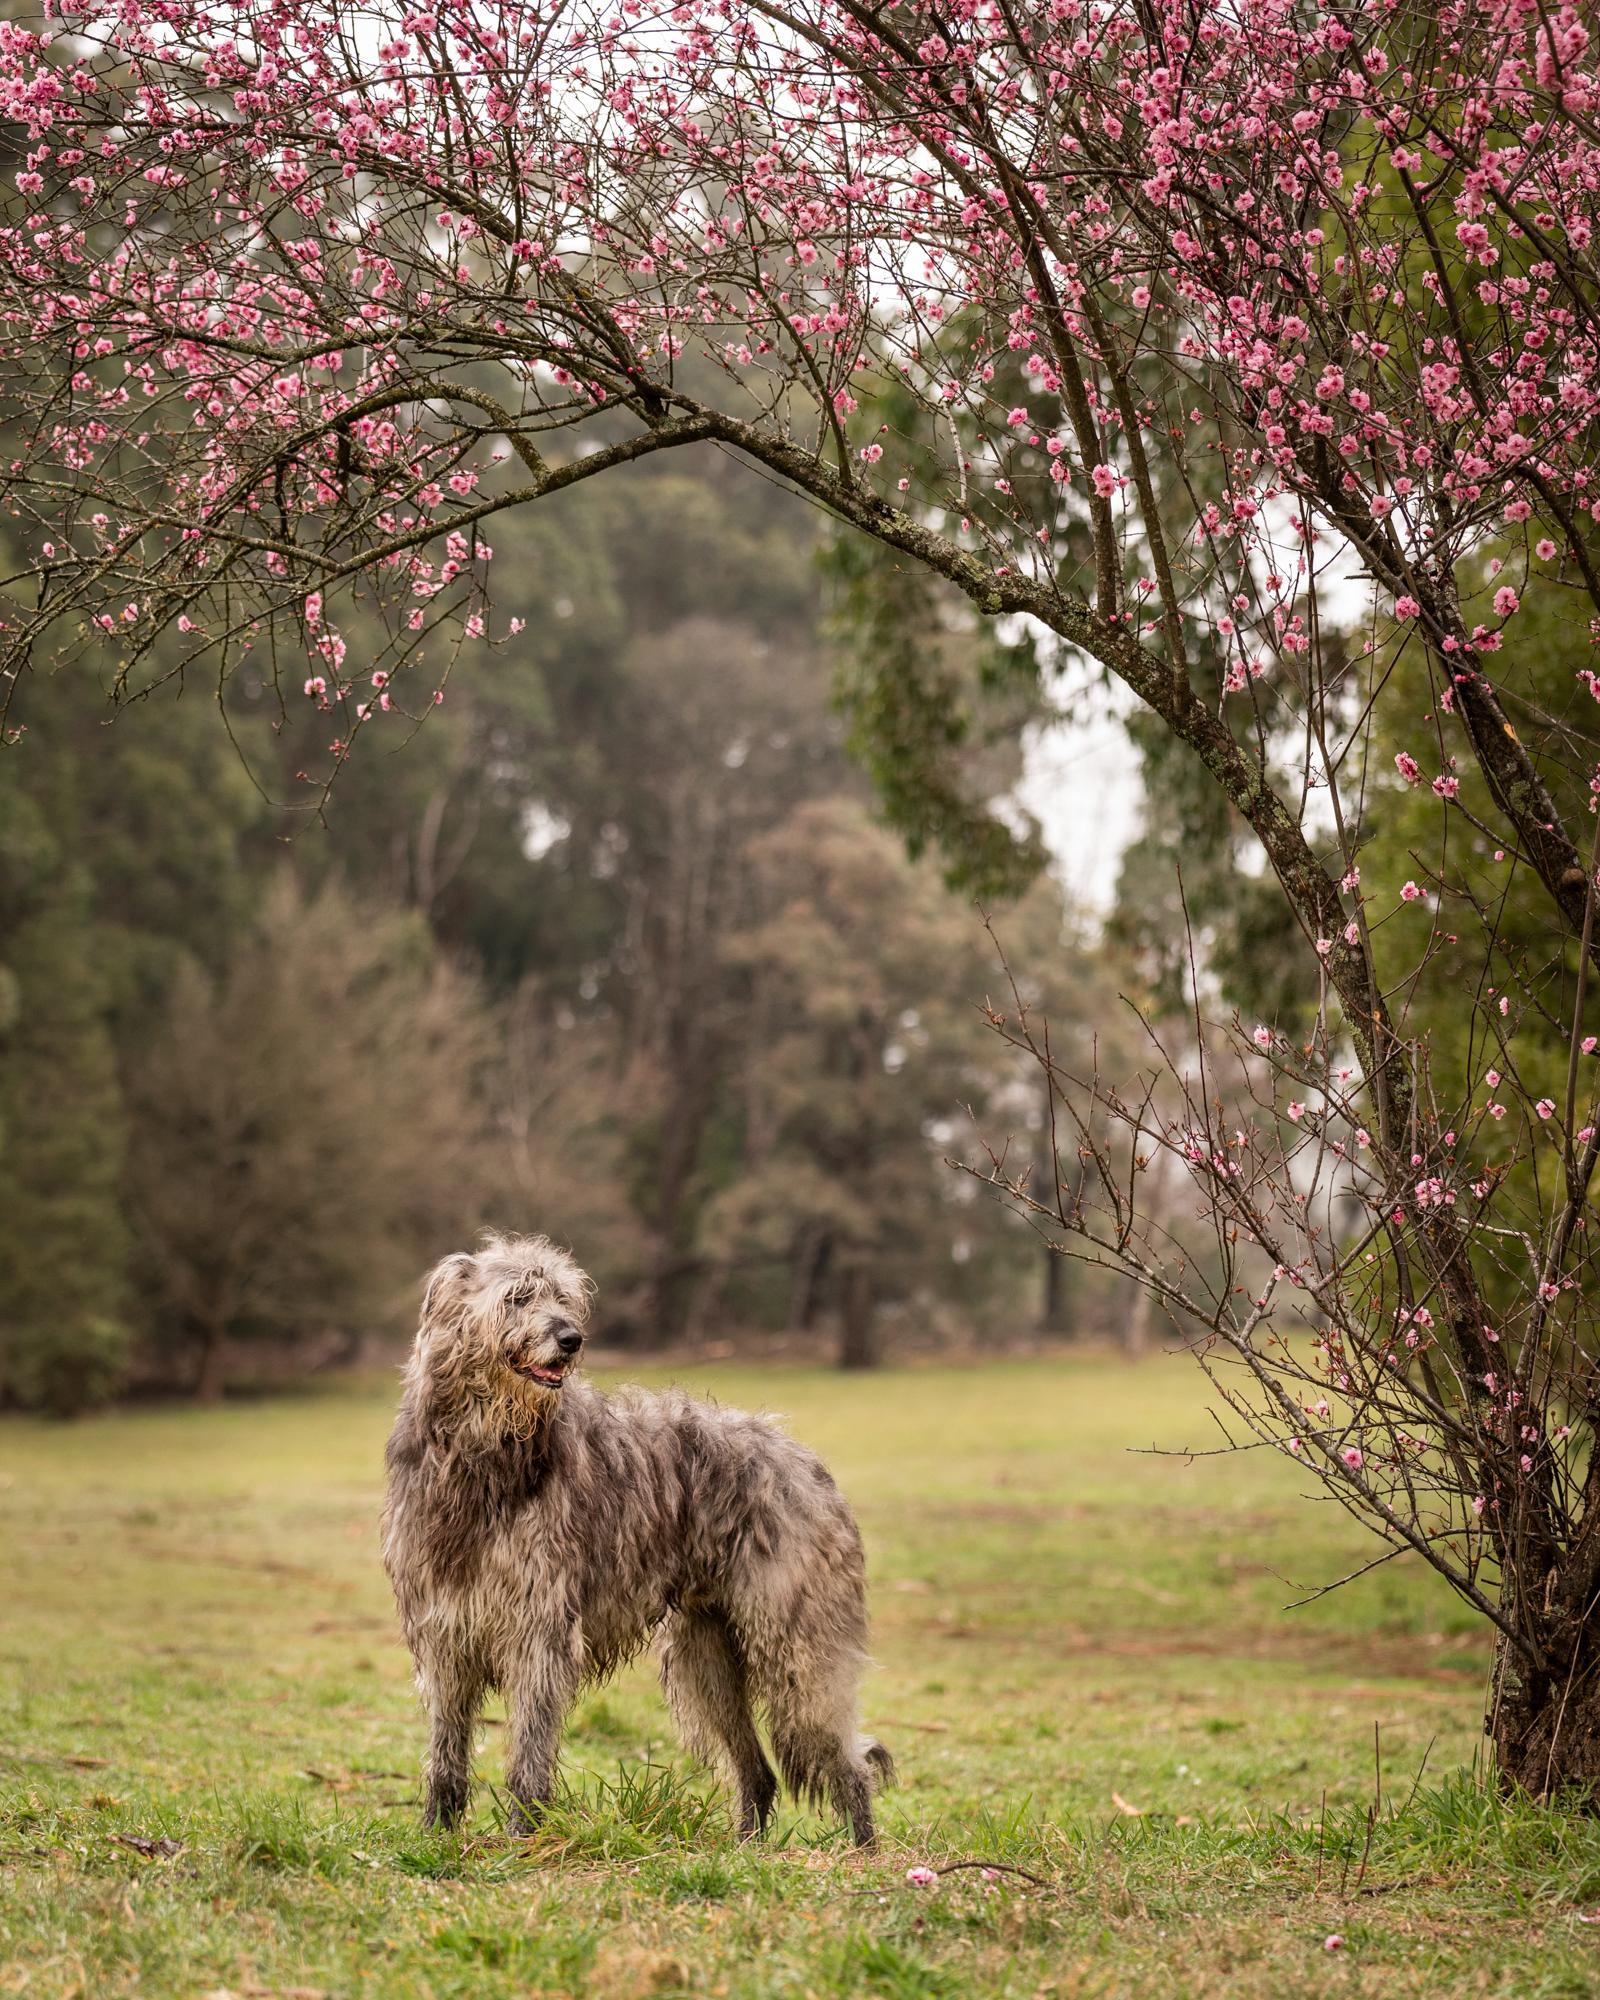 Dixon Photography, Dixon dog photography, dog photography Melbourne, location dog photography, pet photography Melbourne, Melbourne dog photographer, melbourne pet photography, dog photos Melbourne, wolfhound, wolfhound cross